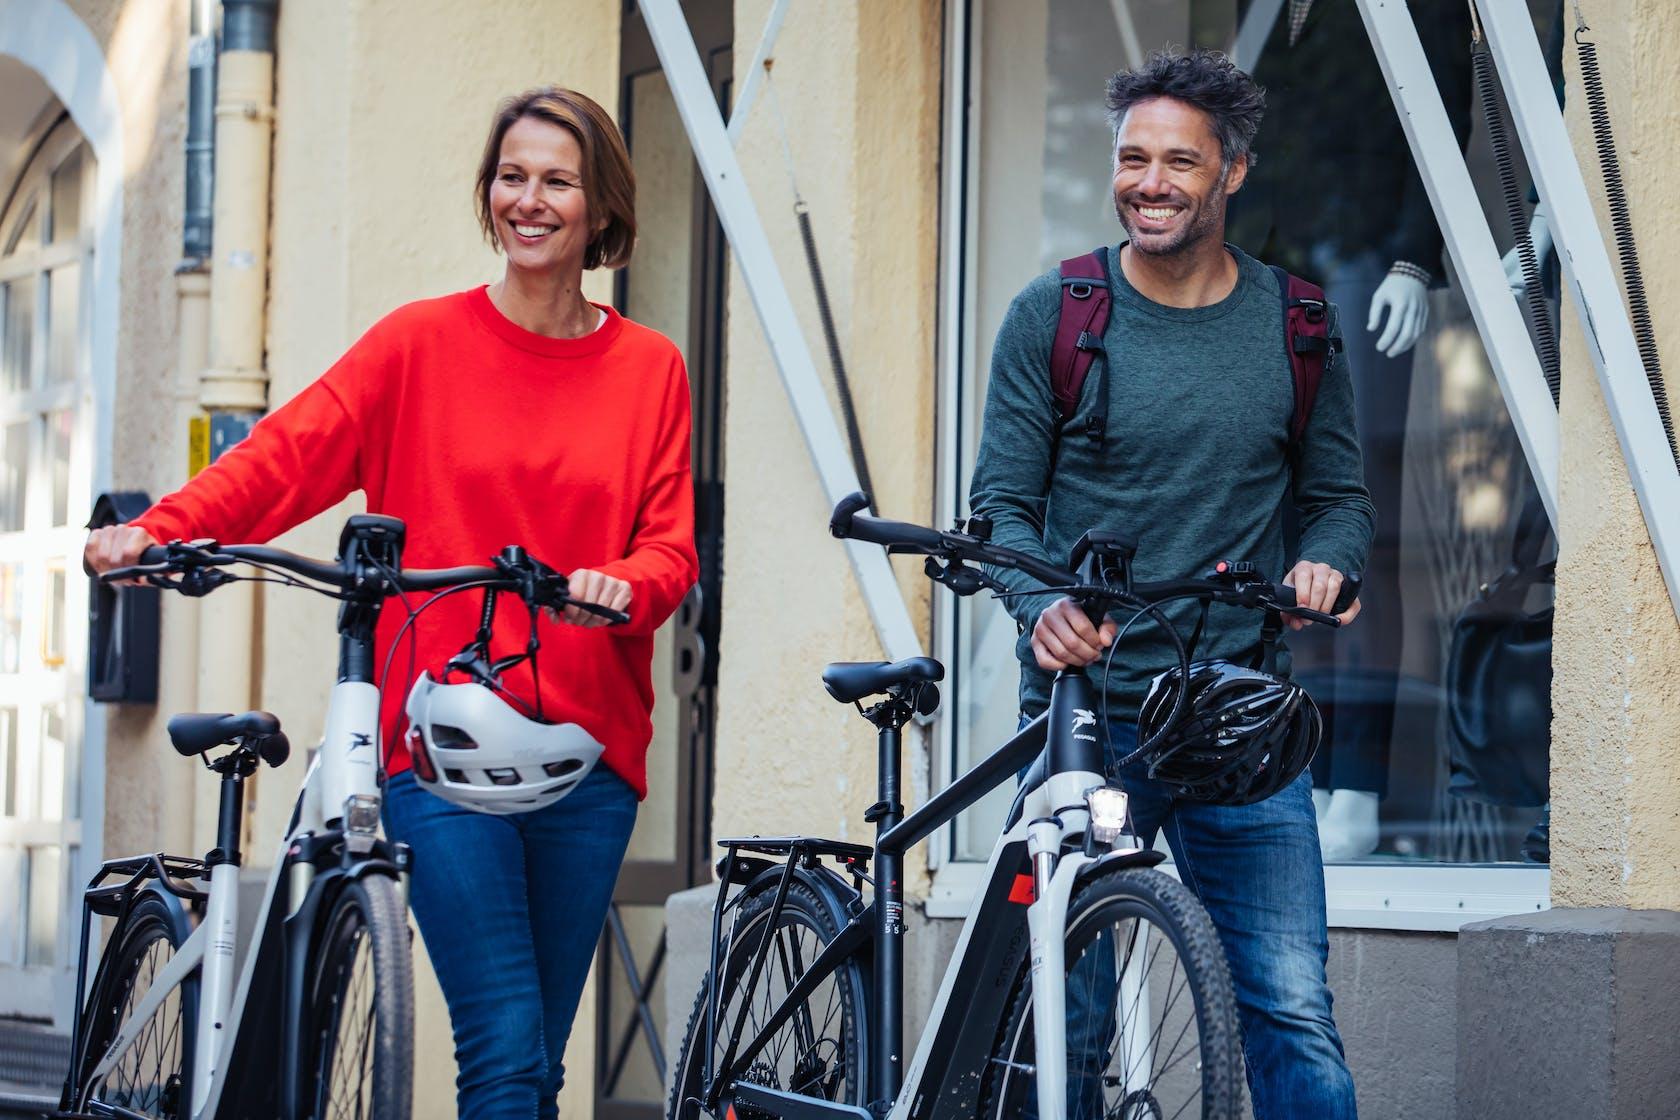 Abbigliamento bike shop online